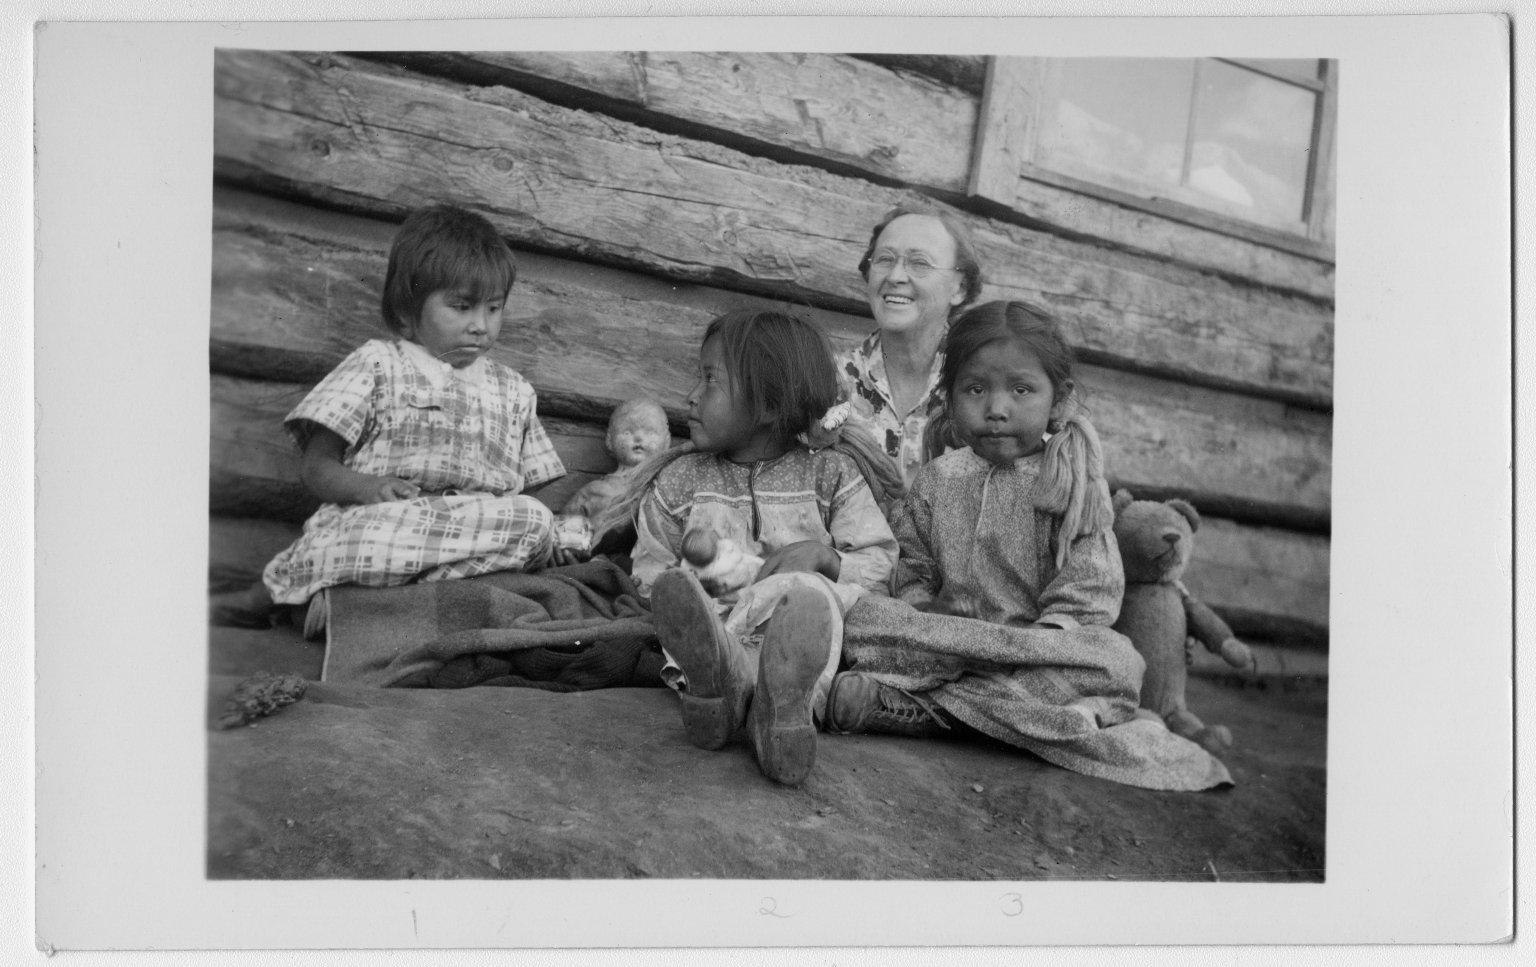 Jicarilla Apache children